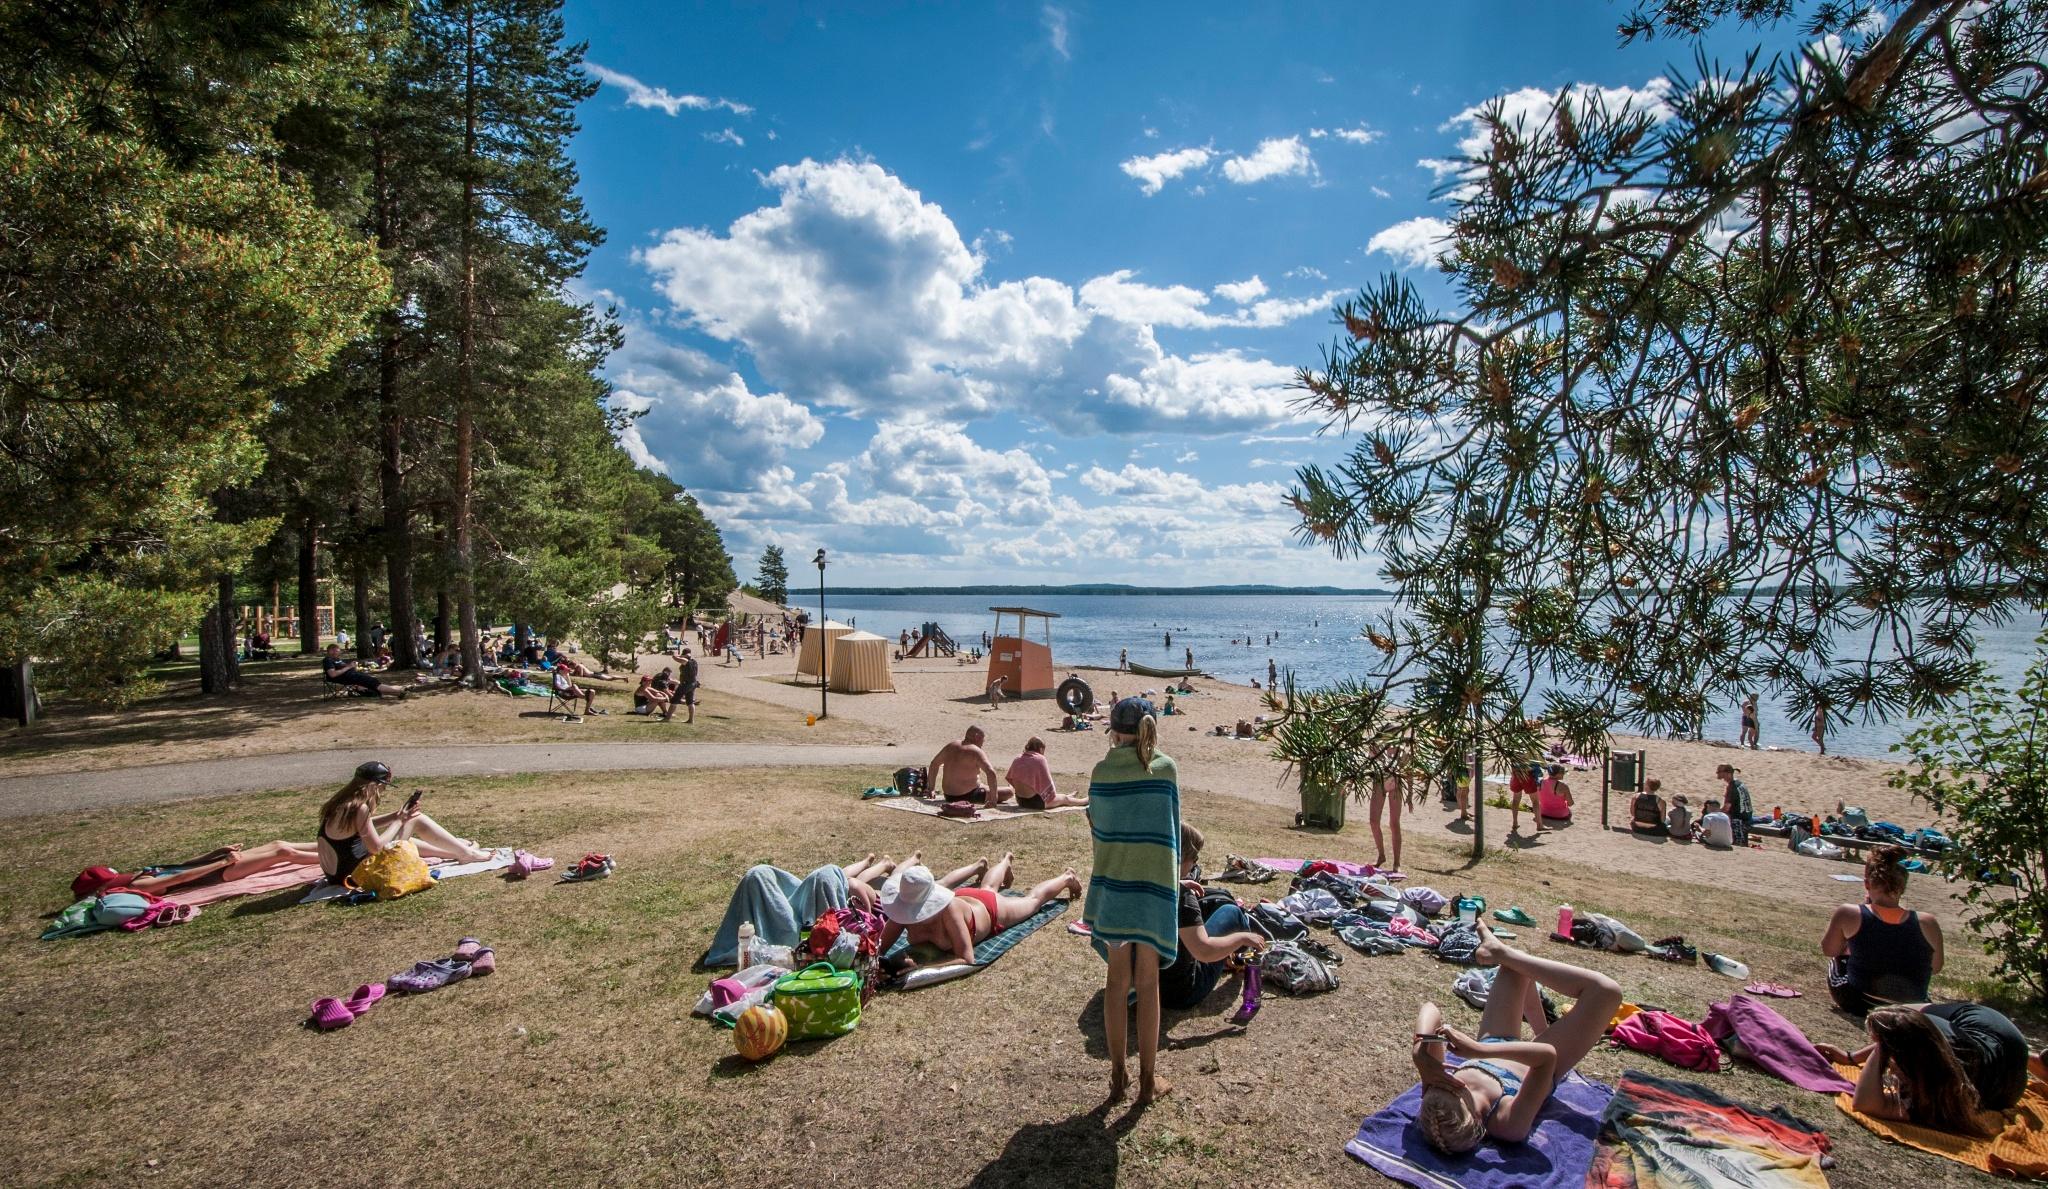 Hiukan Uimaranta Sotkamo Vuokatti Finland Ranta Outdooractive Com